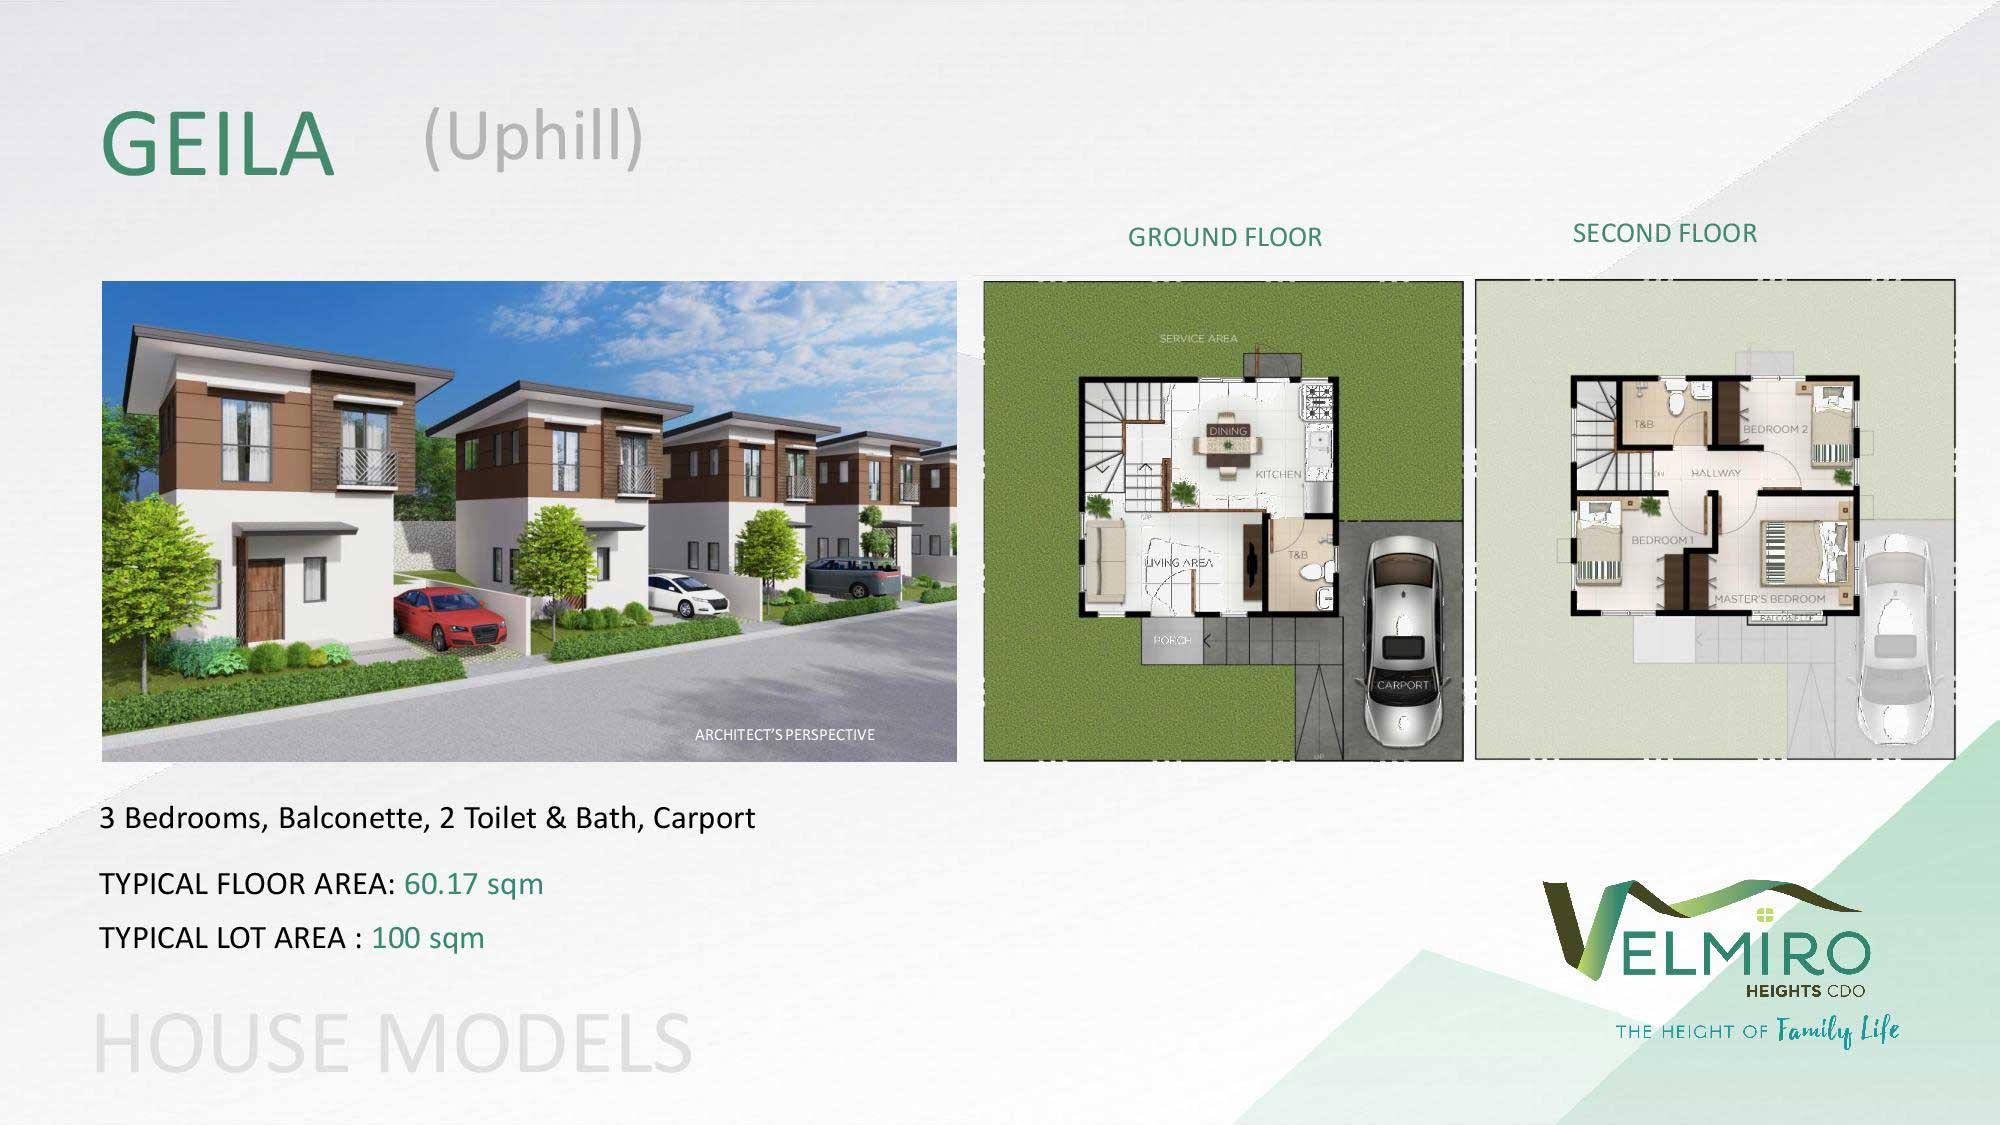 Velmiro heights agusan house model geila uphill web gmc